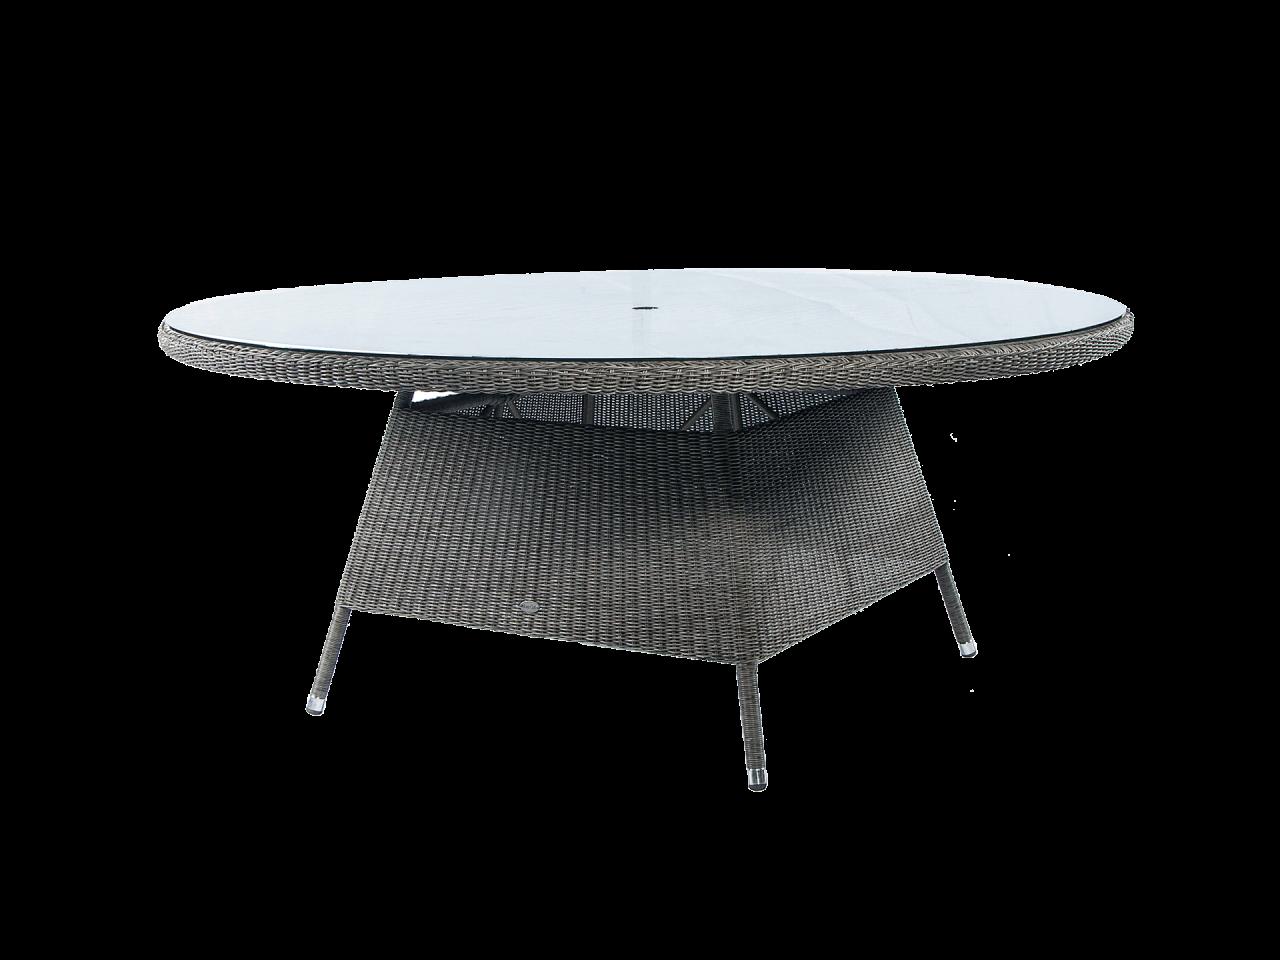 Стол со стеклом Monte Carlo 1.8 м.